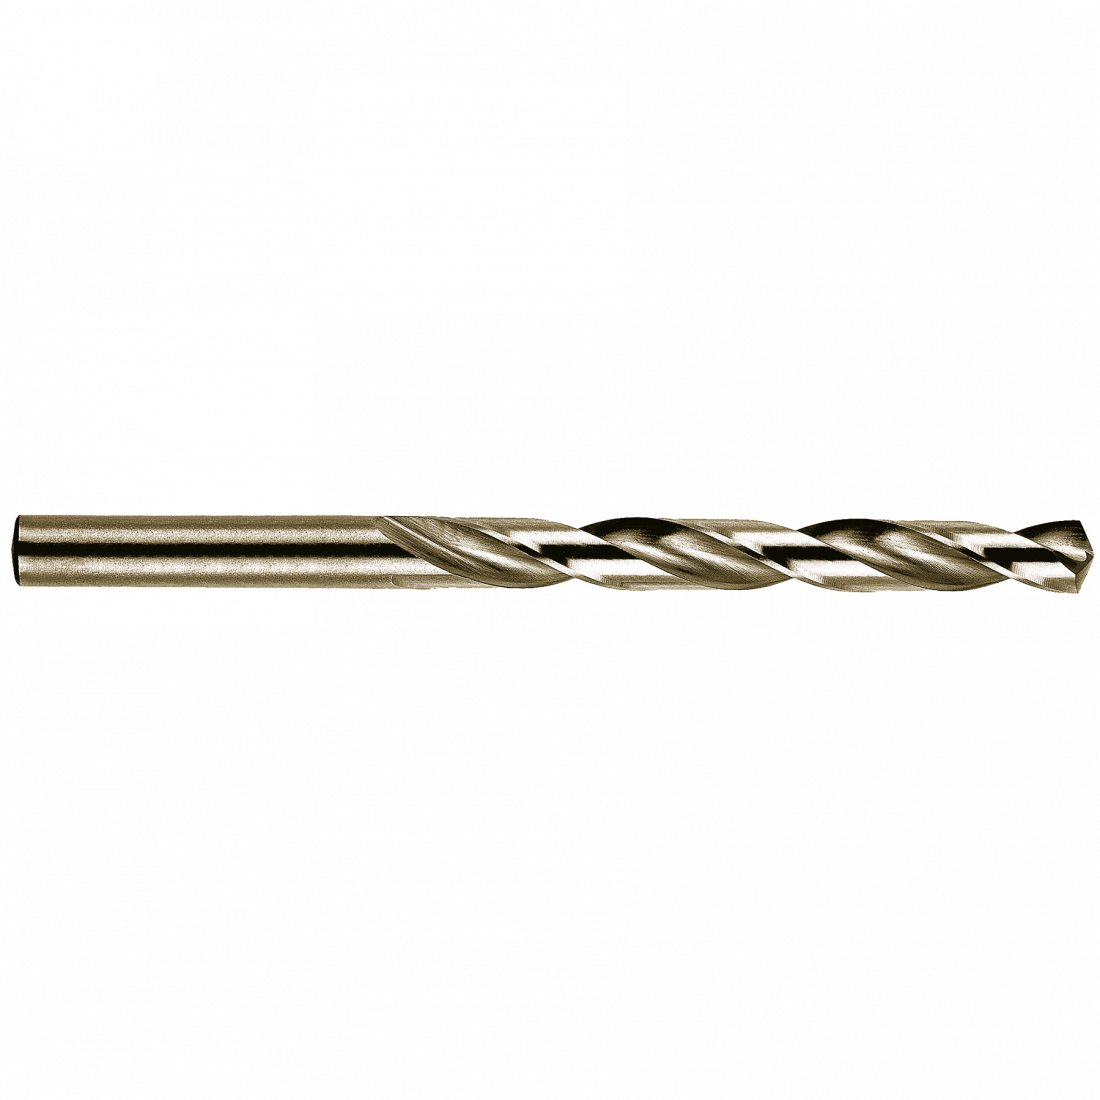 Сверло по металлу Heller НSS-Co DIN 338 RN  8,5x75x117мм (10шт)